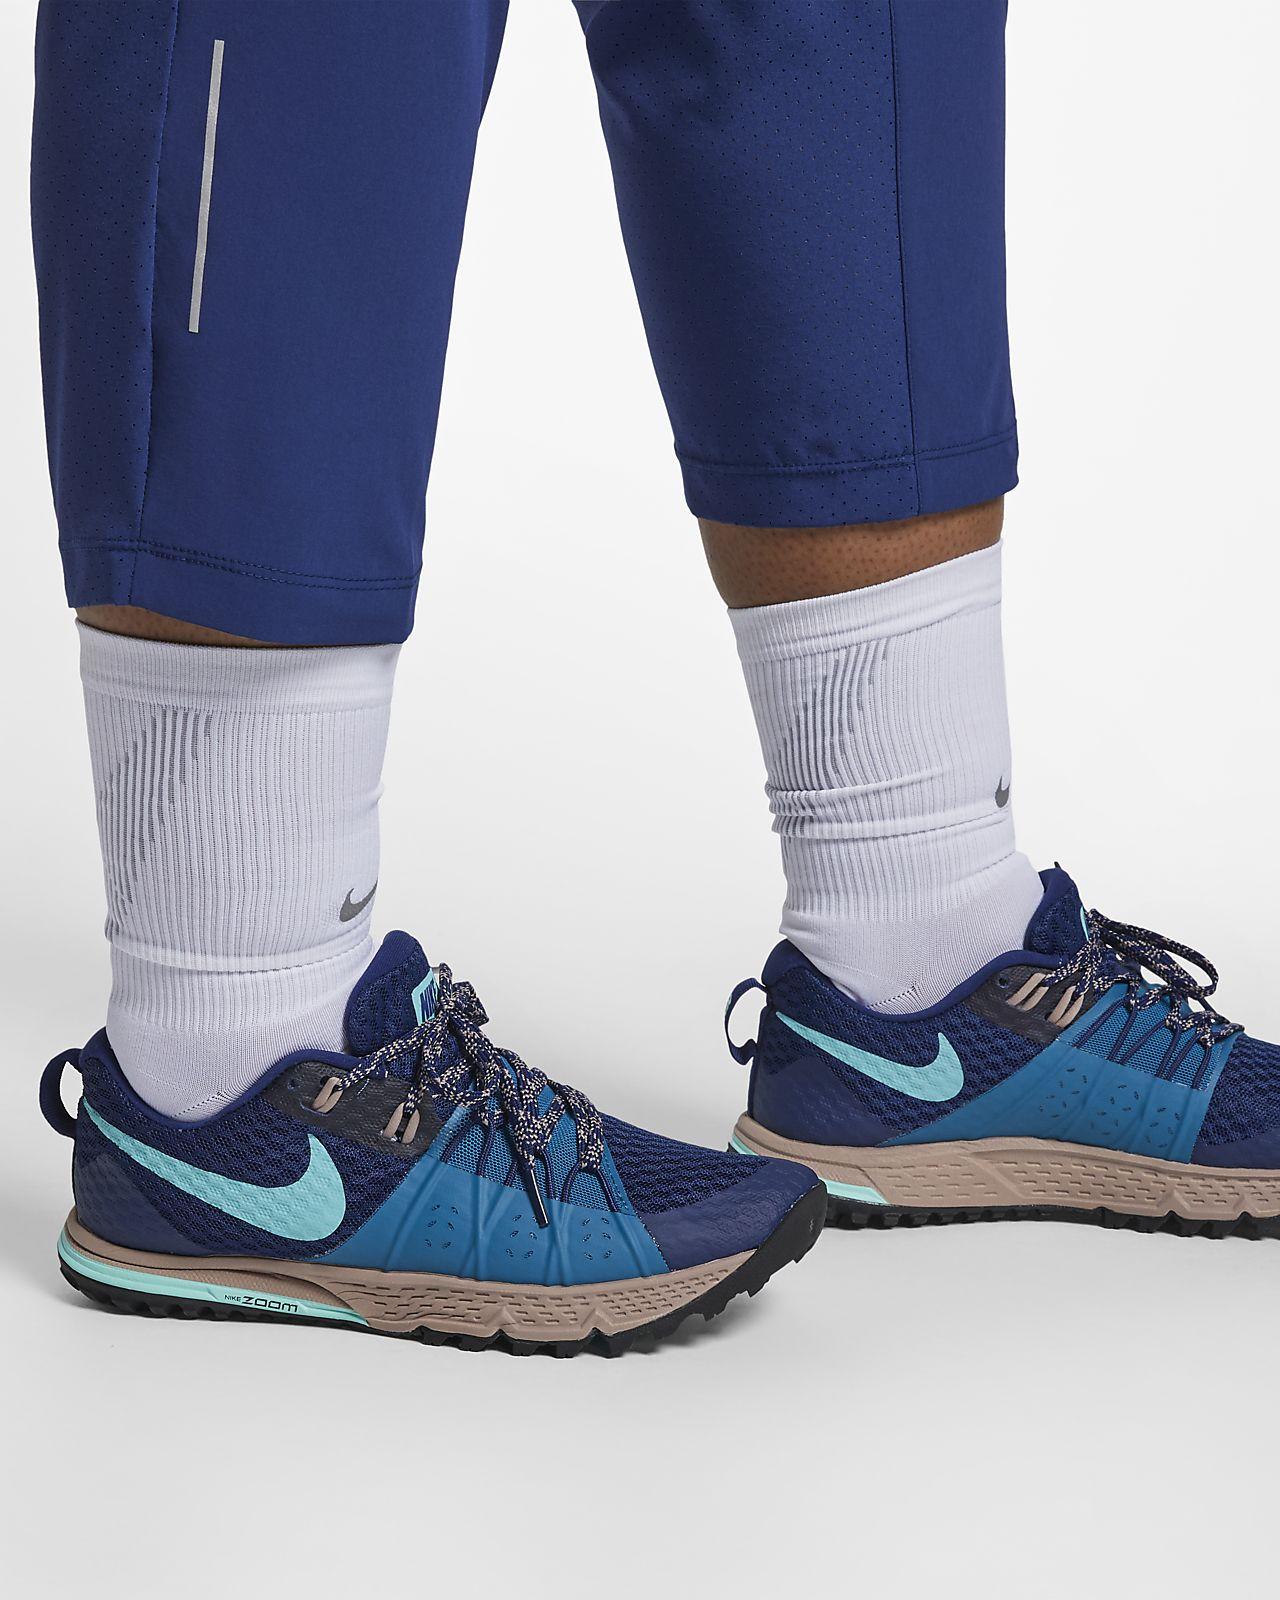 Pantaloni Nike Flex Essential Blu Da Corsa Uomo Outlet